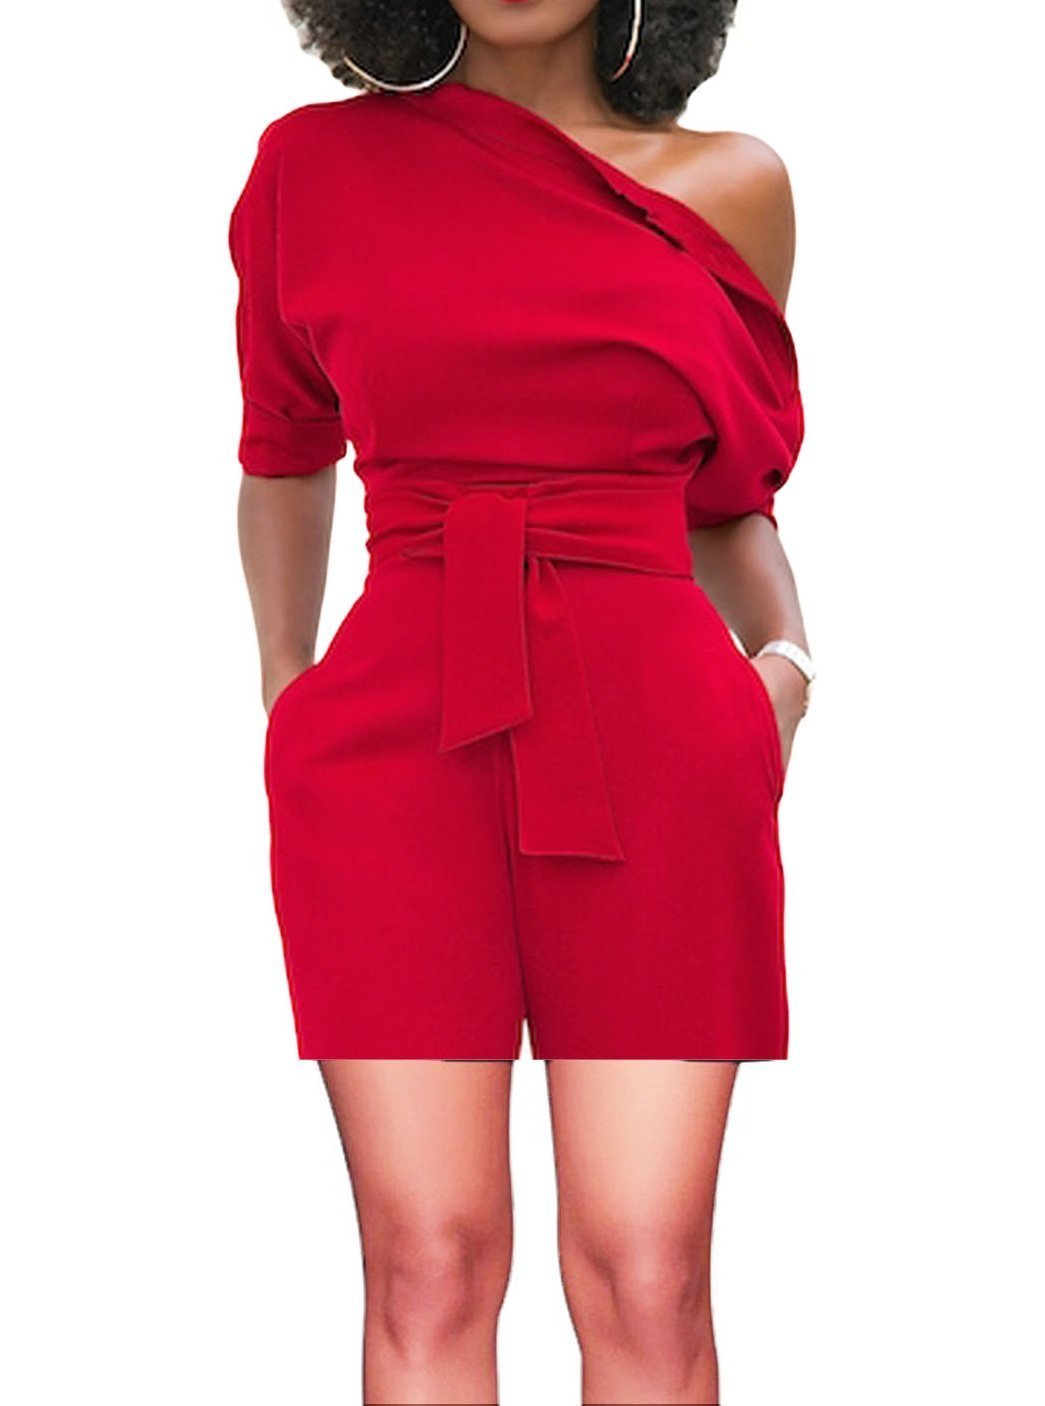 ThusFar Women's Elegant Off Shoulder Hlaf Sleeve Shorts Jumpsuits High Waist Romper with Belt Red XL